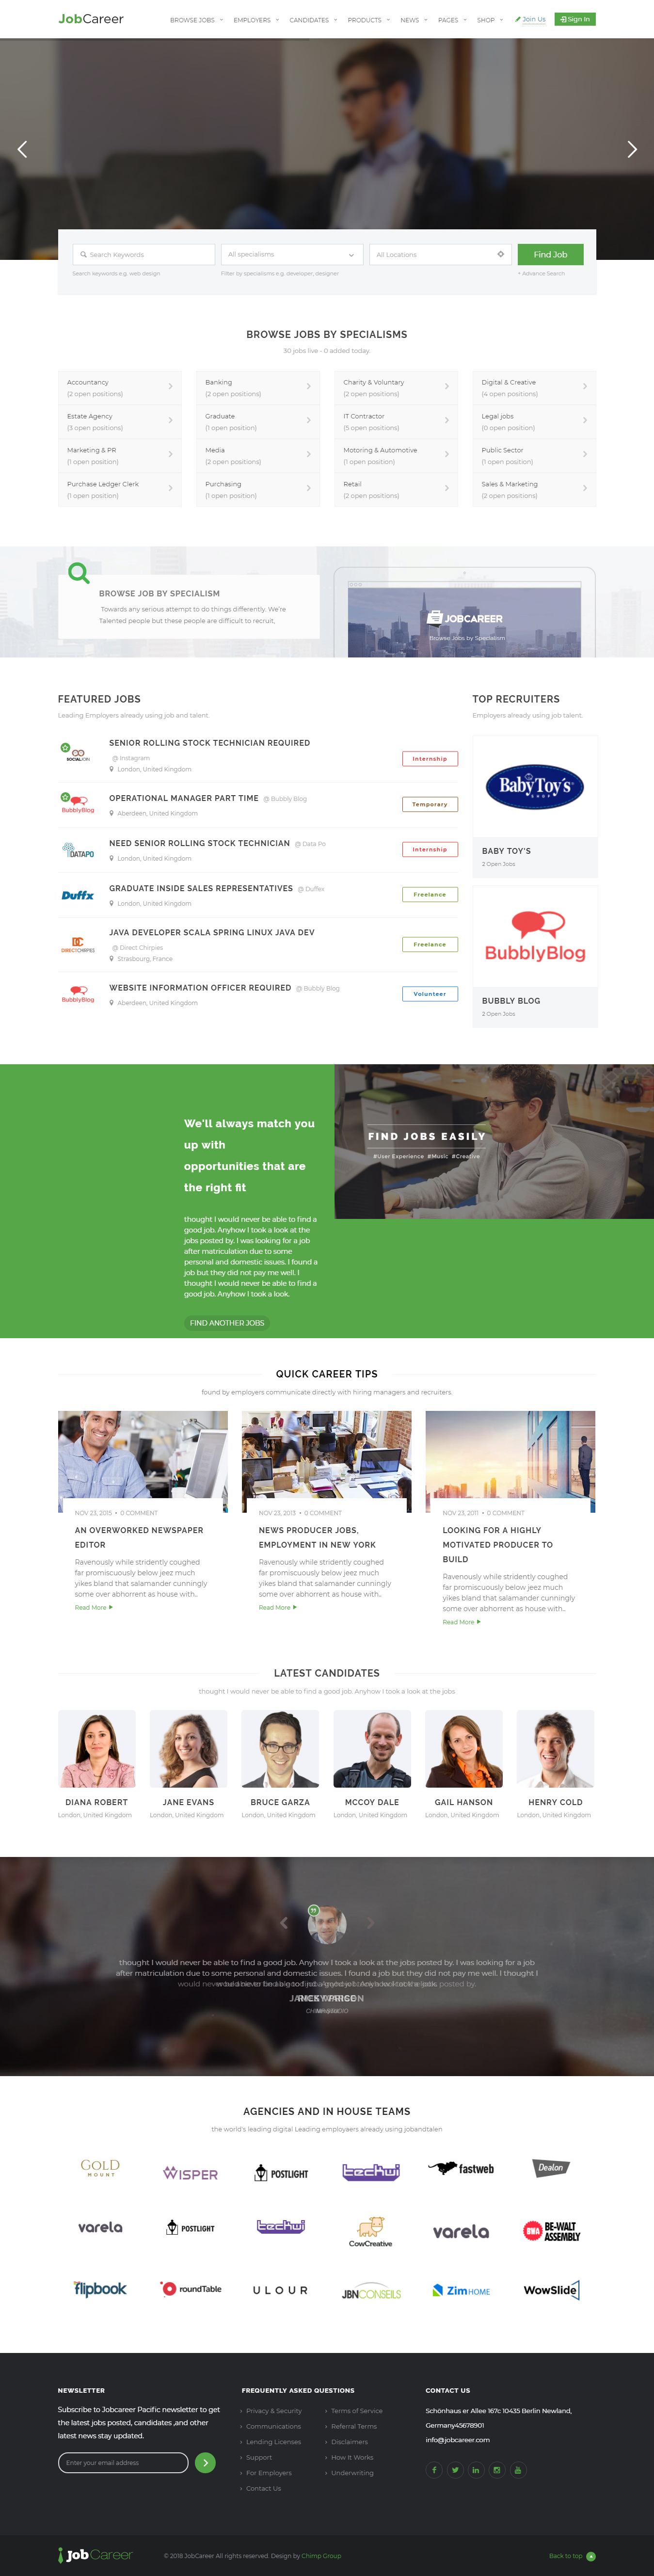 jobcareer best premium job board wordpress theme - 10+ Best Premium Job Board WordPress Themes